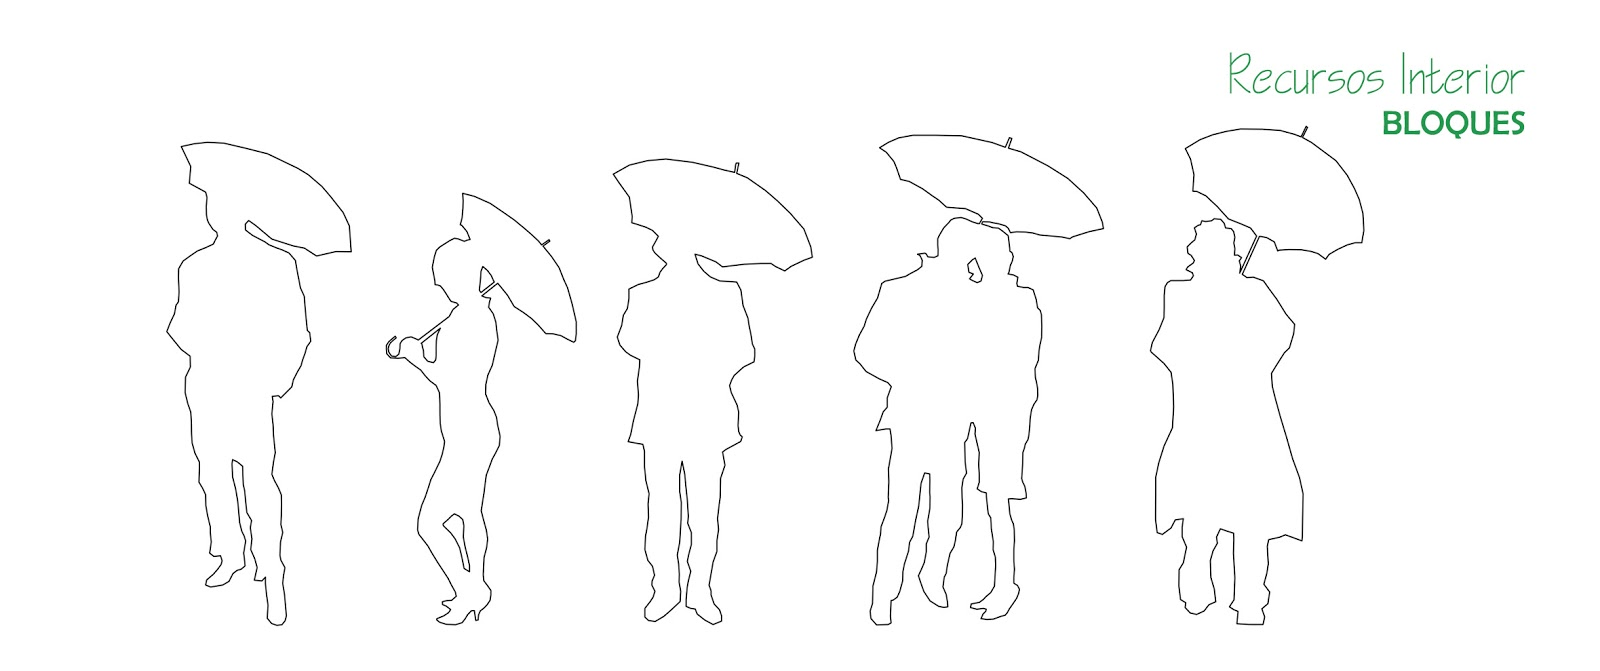 10 bloques para descargar .dwg. Silueta de personas con paraguas ...